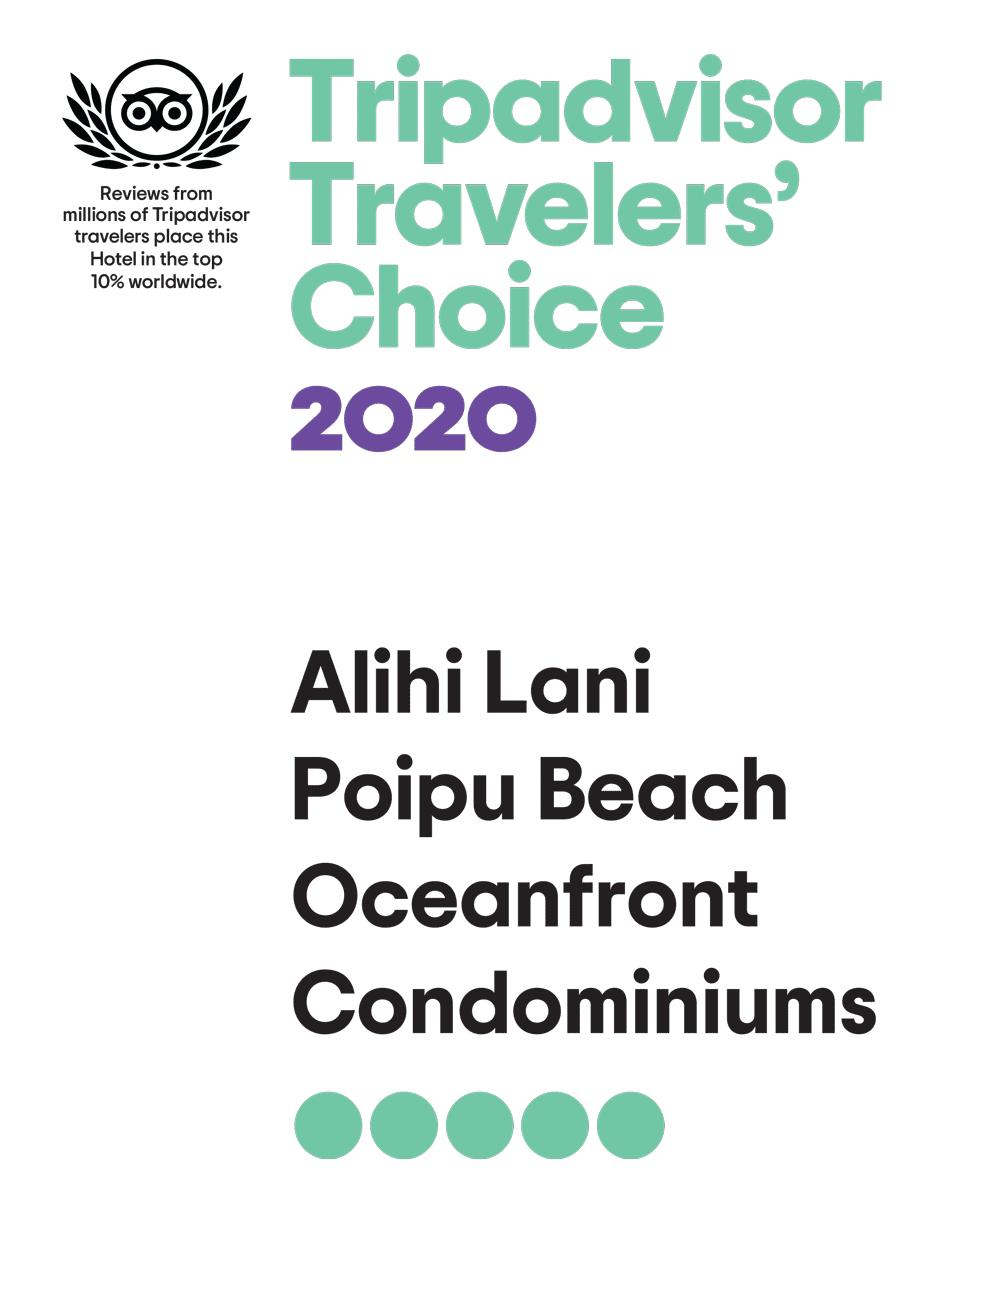 2020 Tripadviser Travelers' Choice Award to Alihi Lani Poipu Beach Oceanfront Condominiums placing it in top 10% worldwide